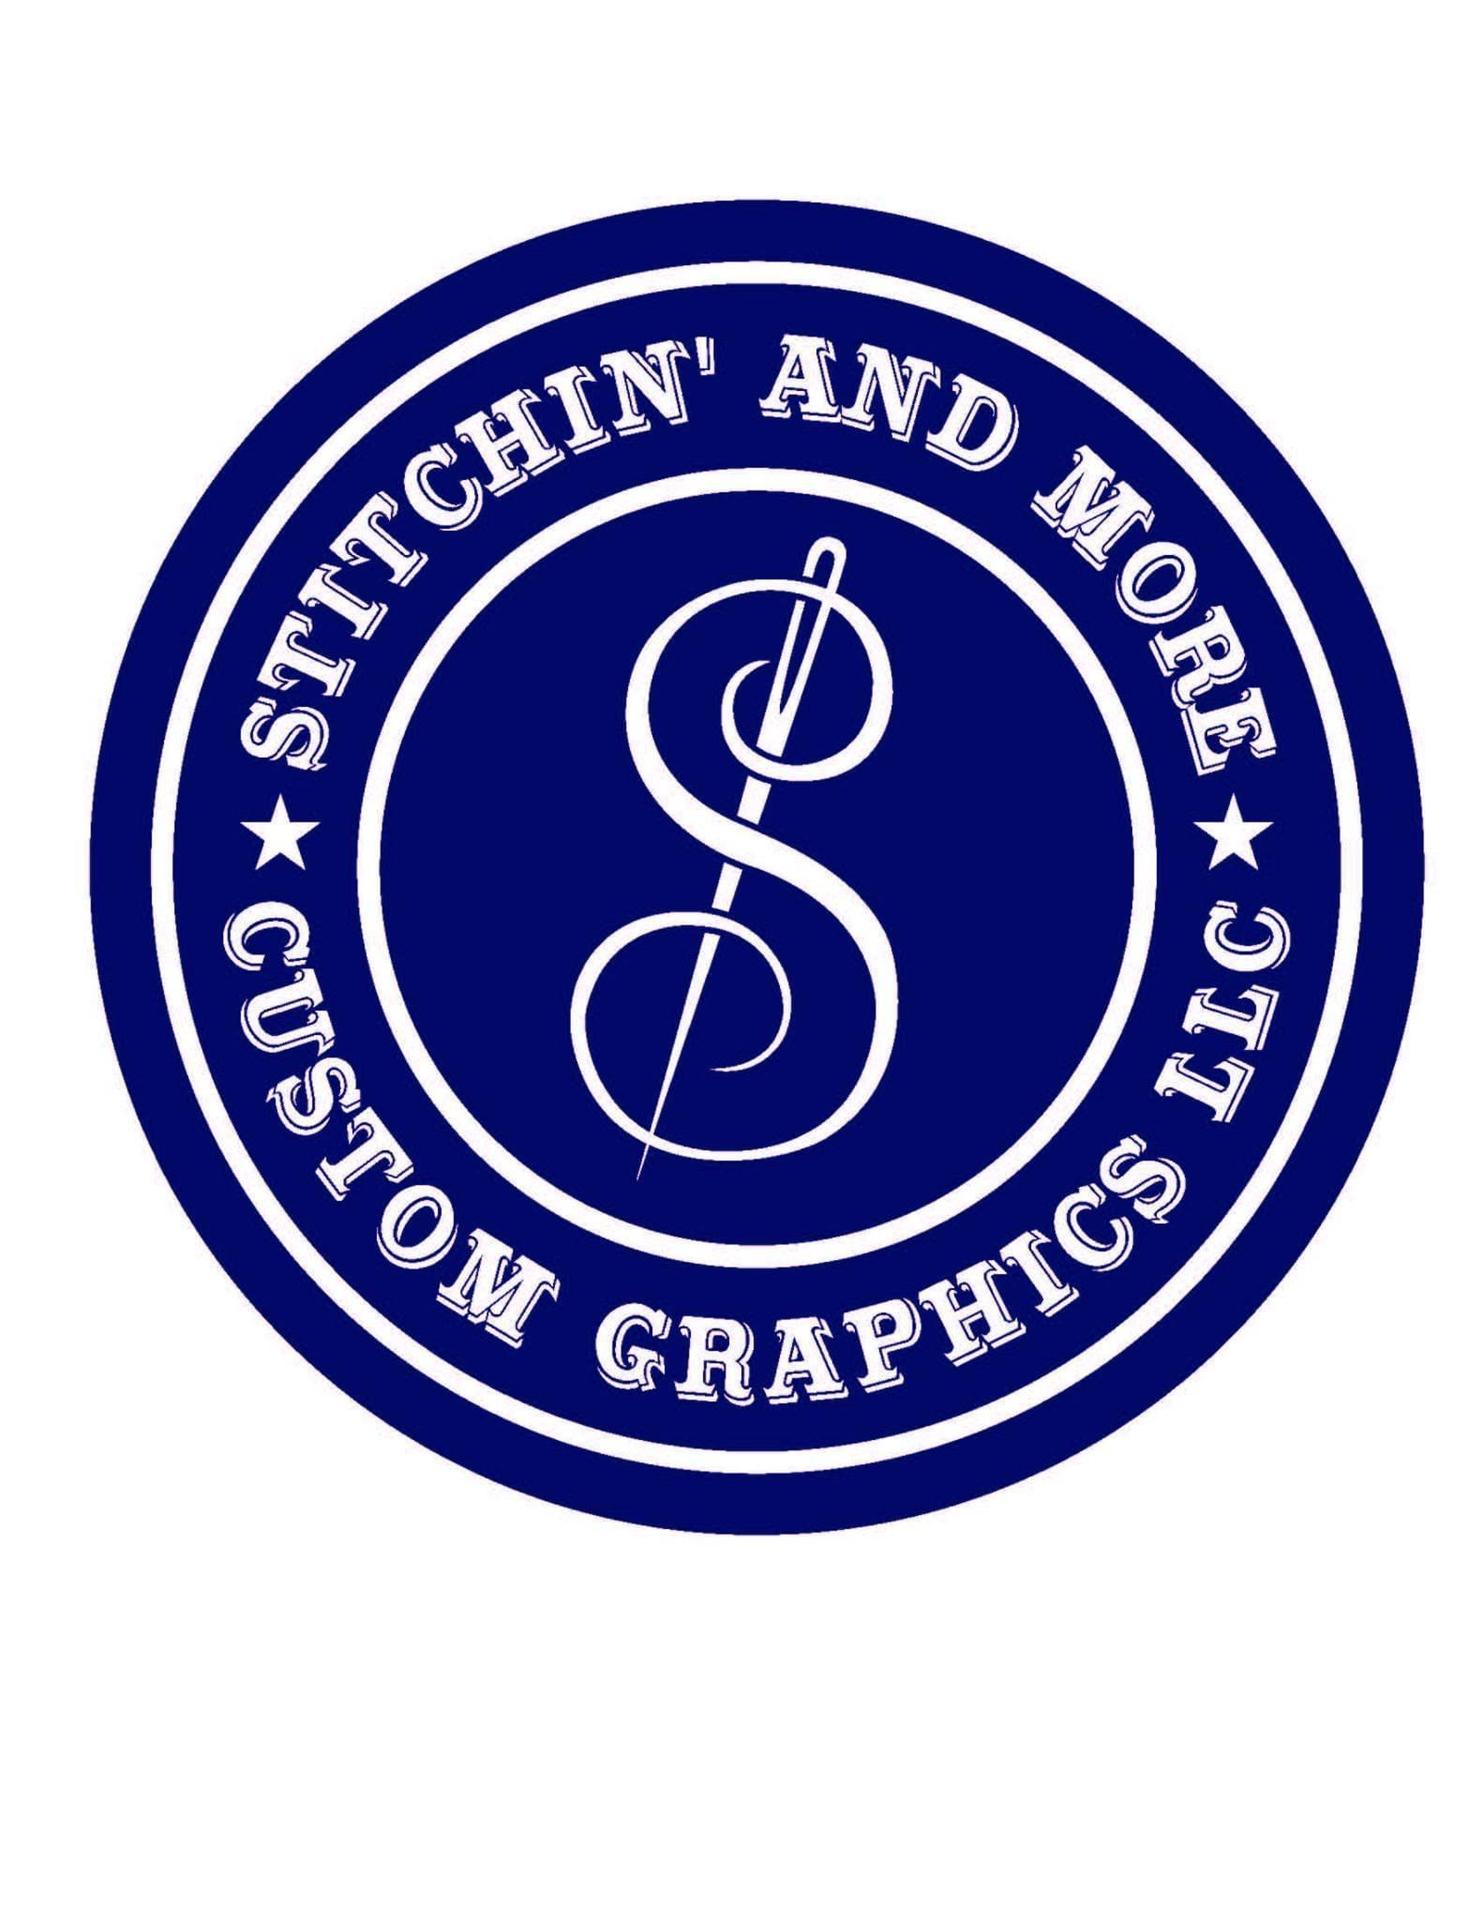 stitchin and more